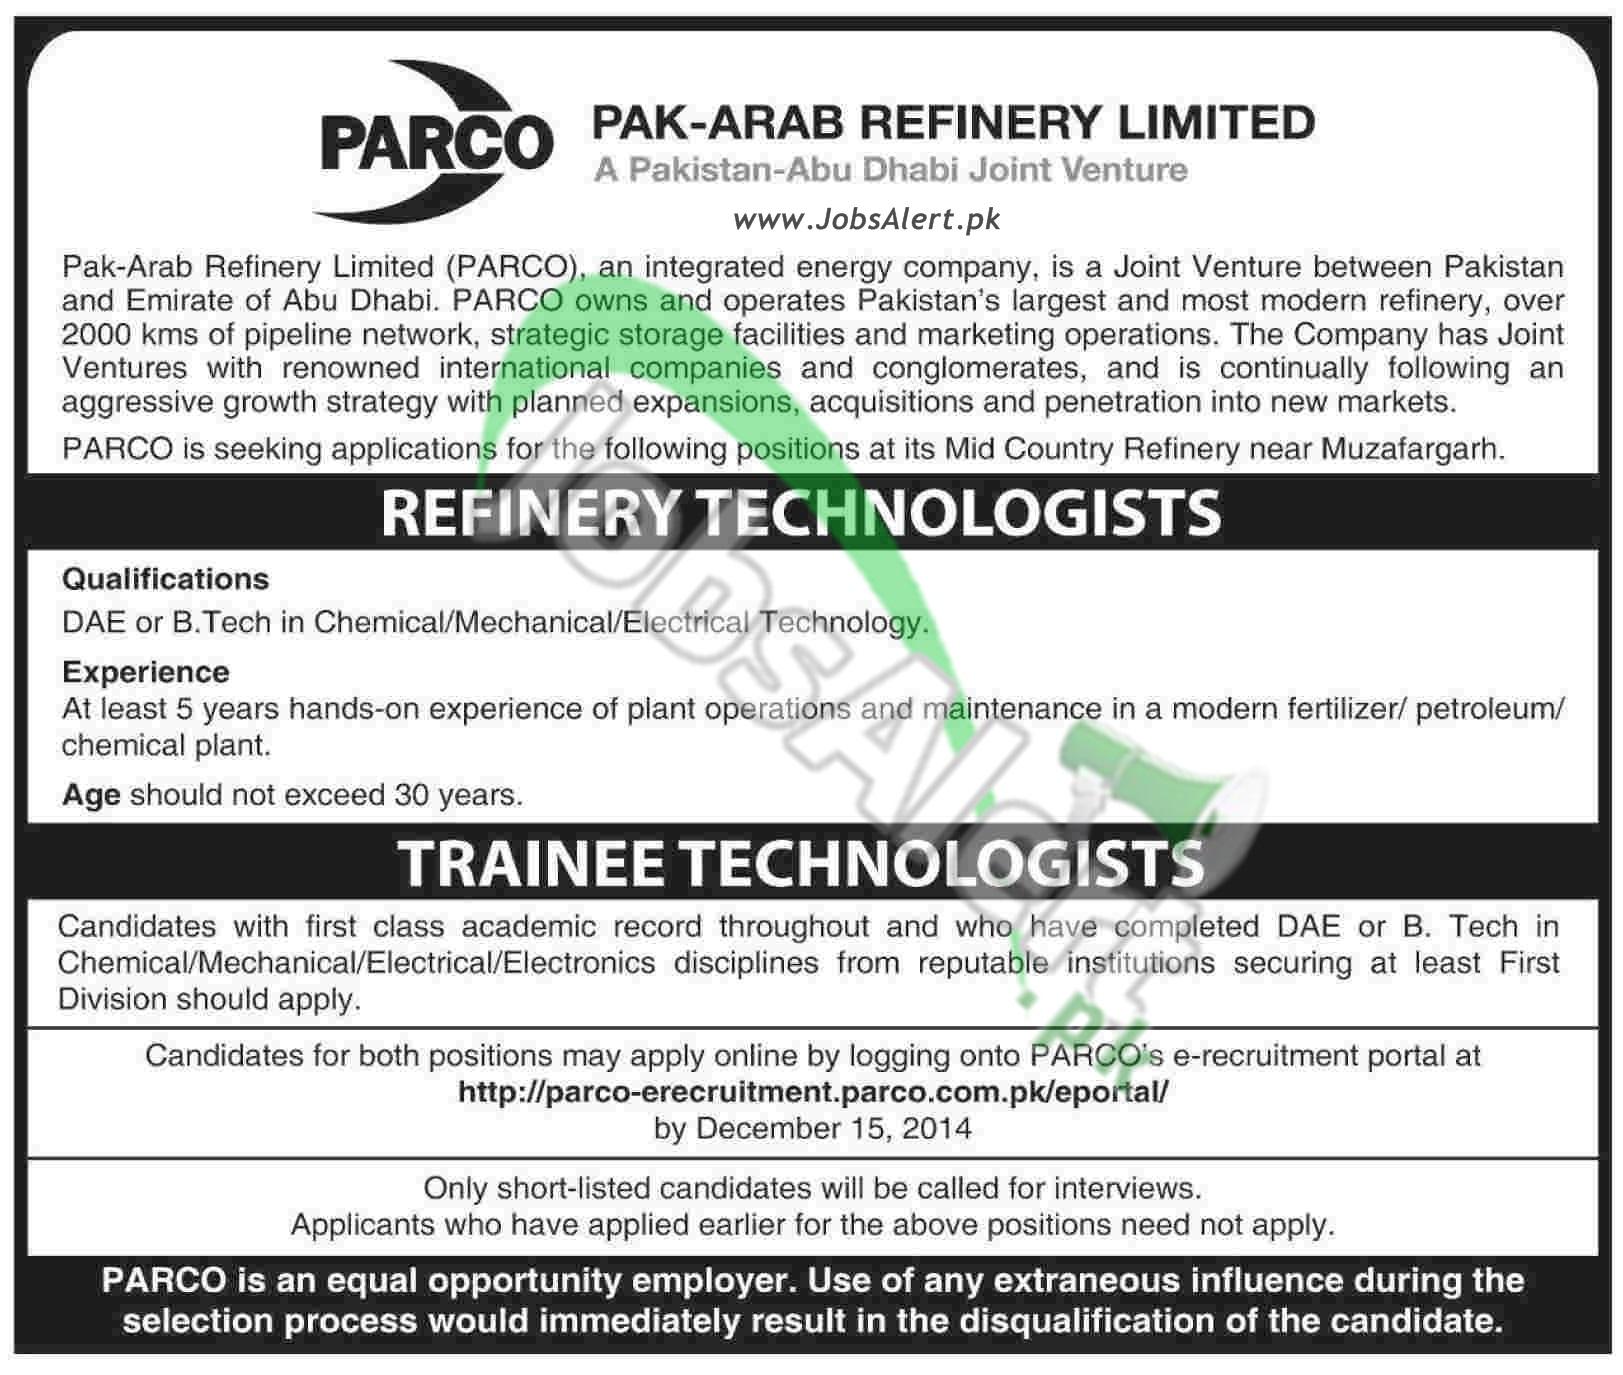 Pak-Arab Refinery Limited